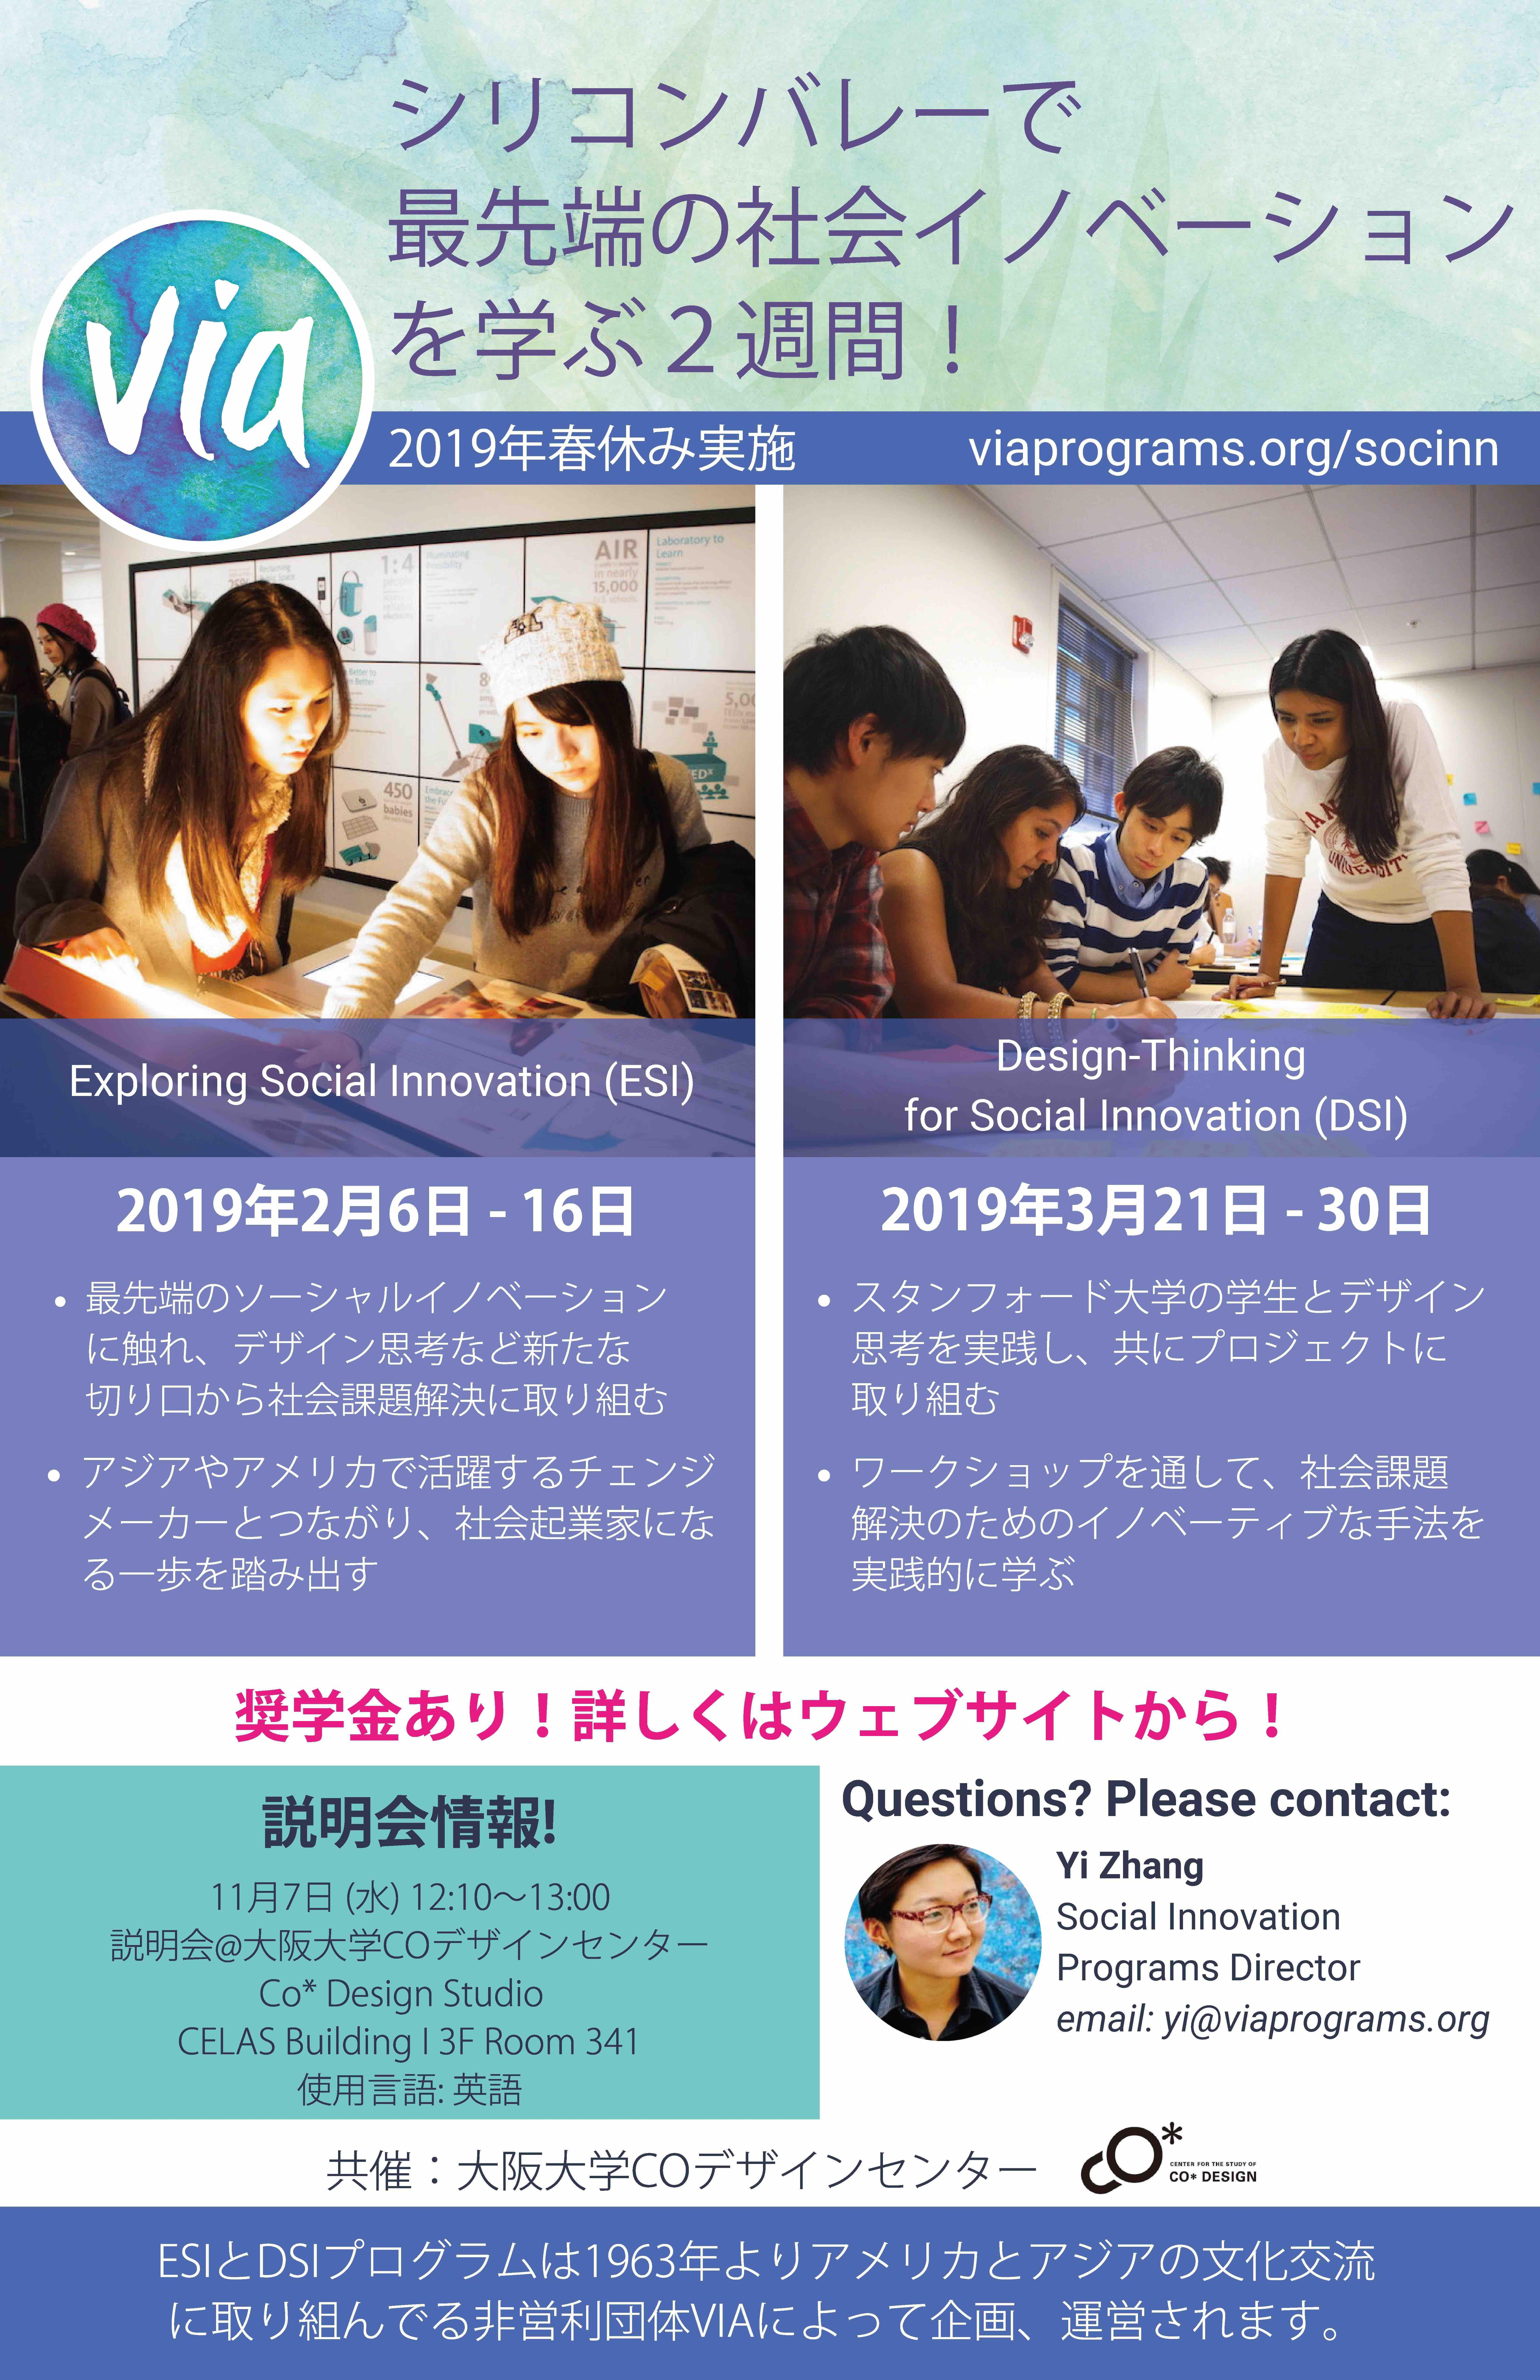 181012ESI-DSI 2019 Osaka_r.jpg